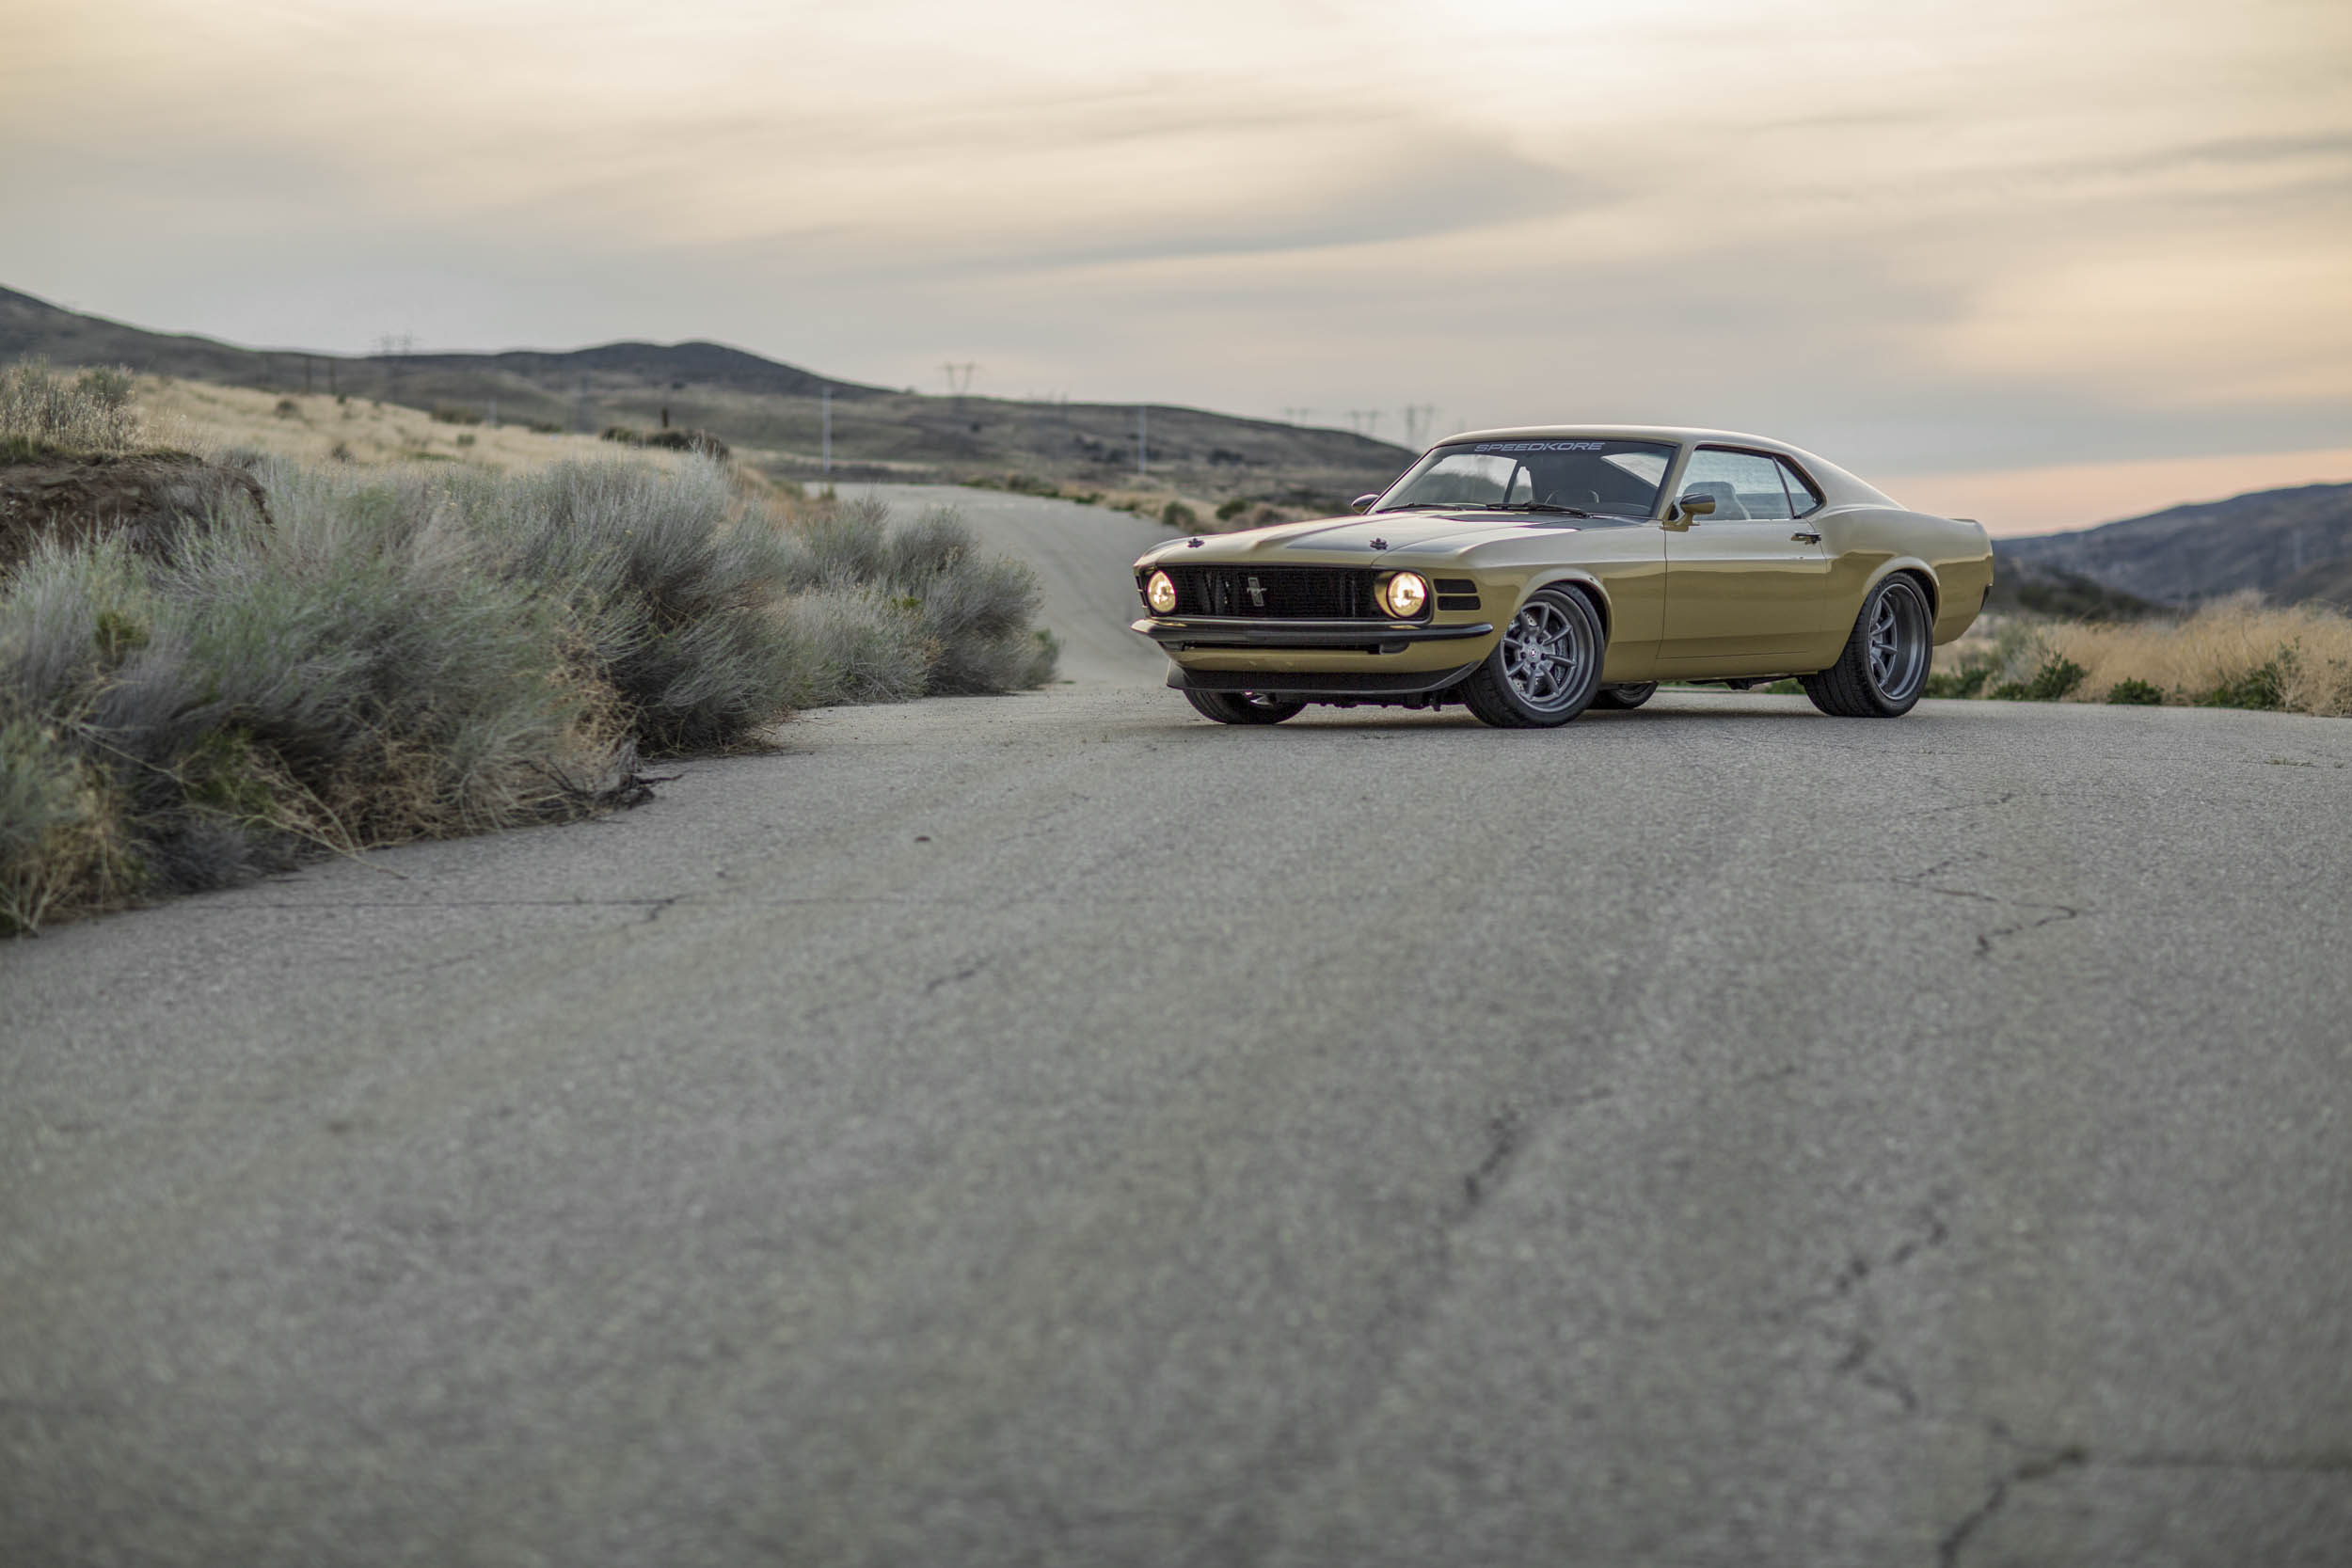 Robert Downey Jr.'s Speedkore 1970 Mustang in the desert